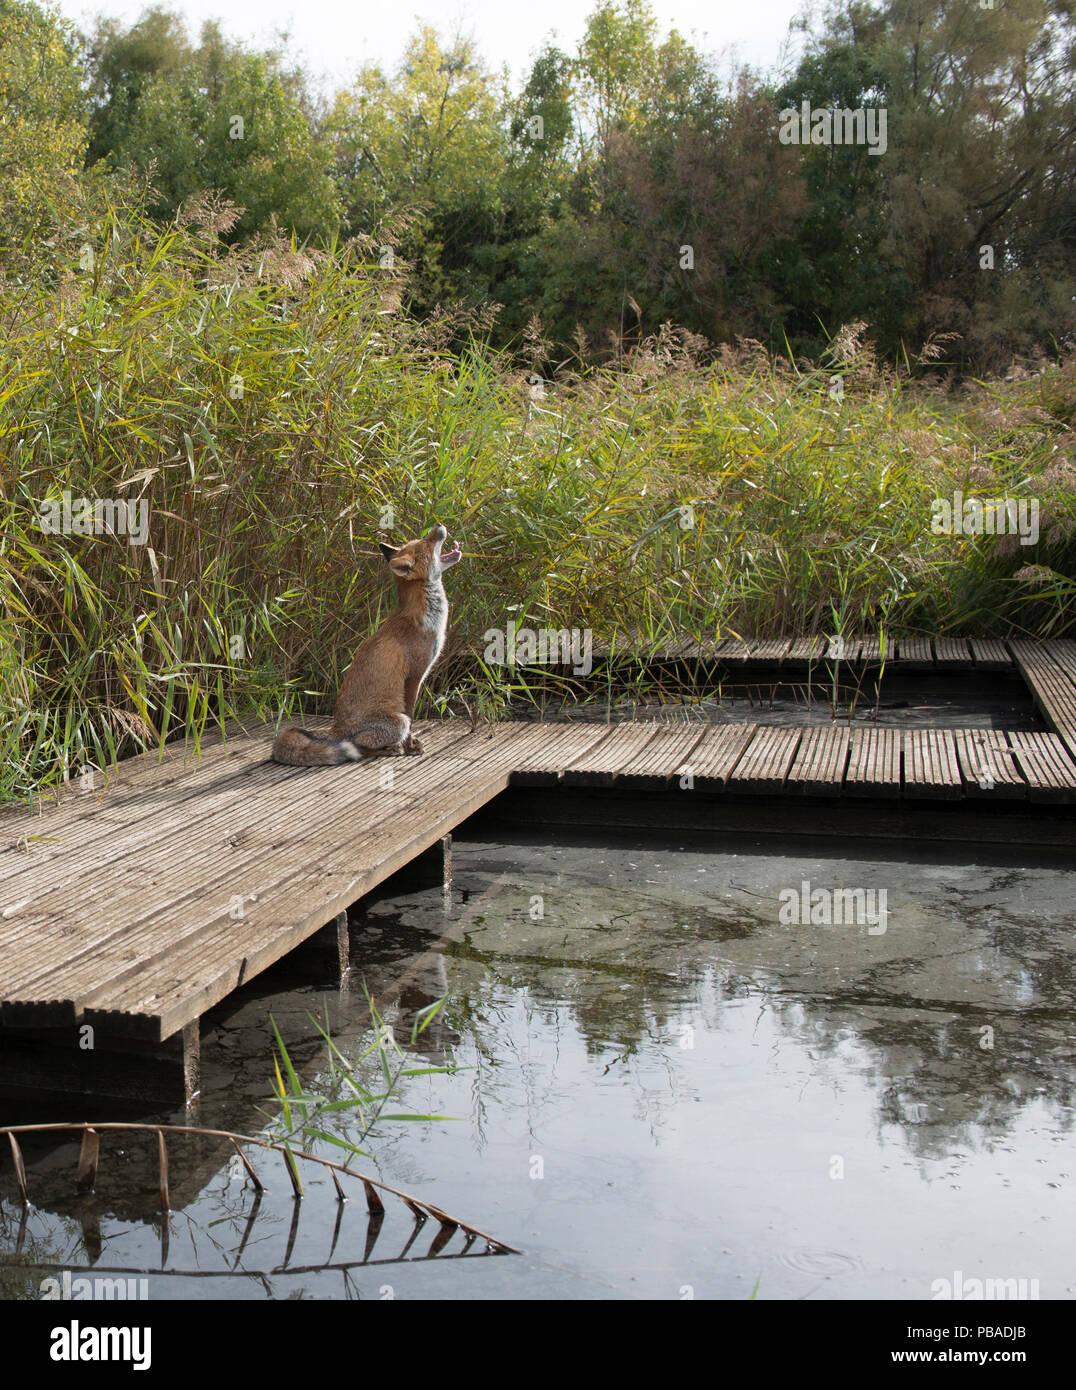 Red fox (Vulpes vulpes) sitting on board walk in marsh, Camargue, France, September. - Stock Image